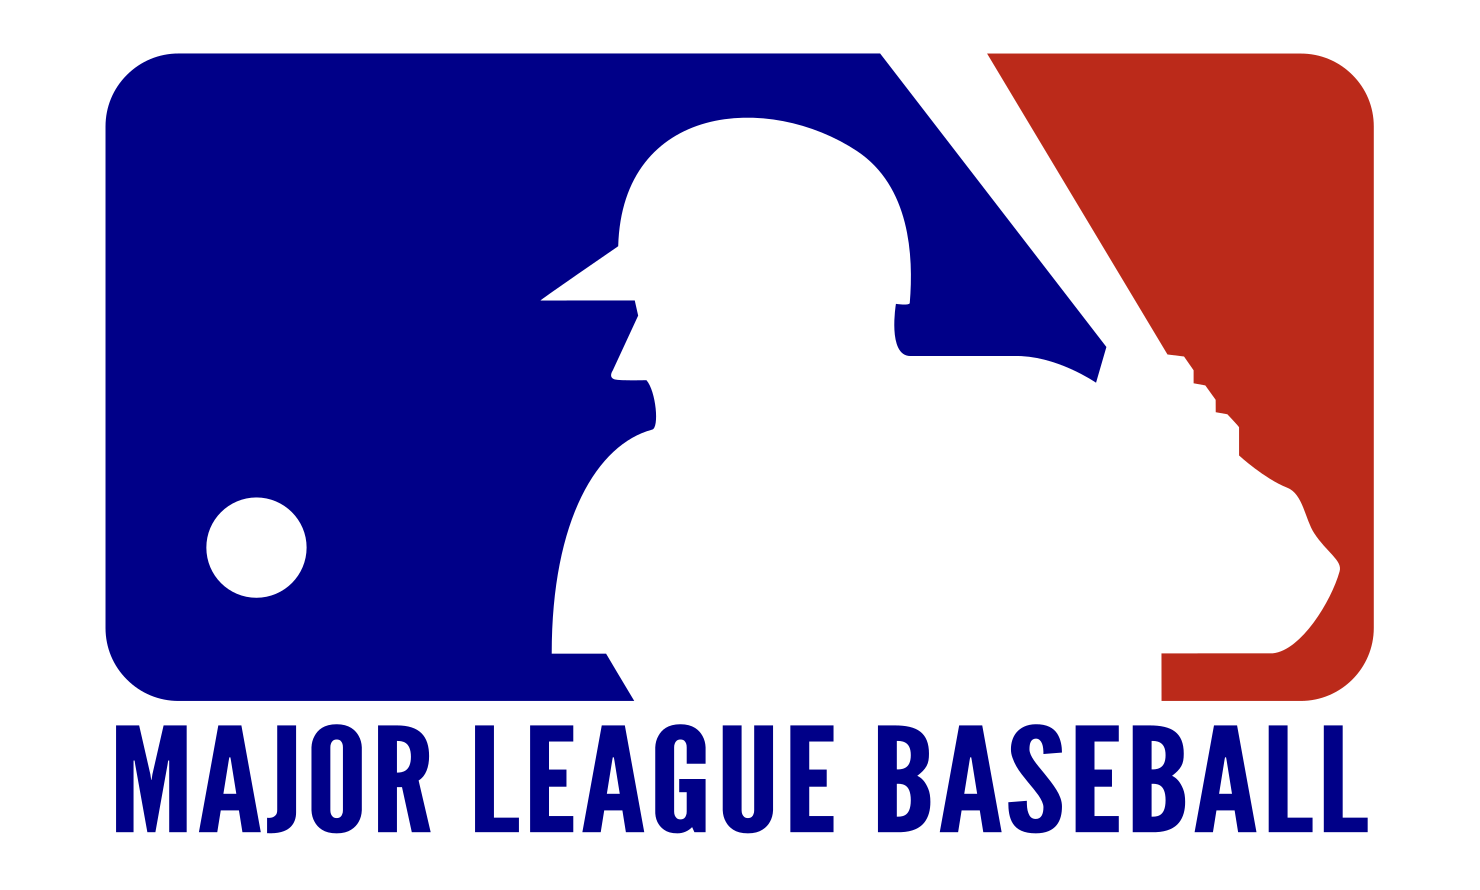 http://www.globalwebdirectorylist.com/wp-content/uploads/2019/11/MLB-Logo.png